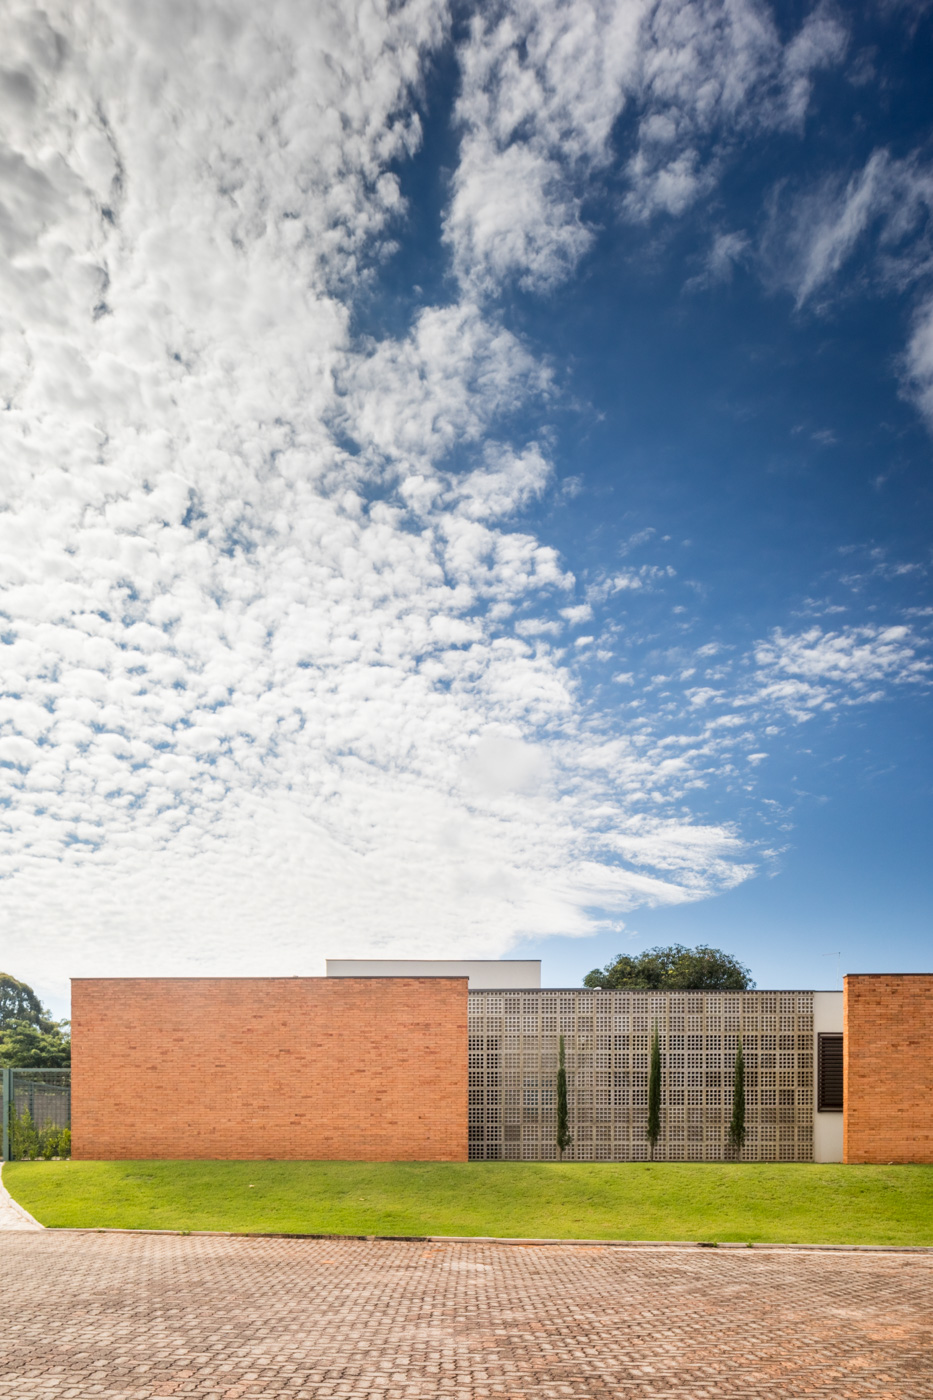 Mova-arquitetura-foto-haruo-mikami_B_025-HDR_Baixa.jpg